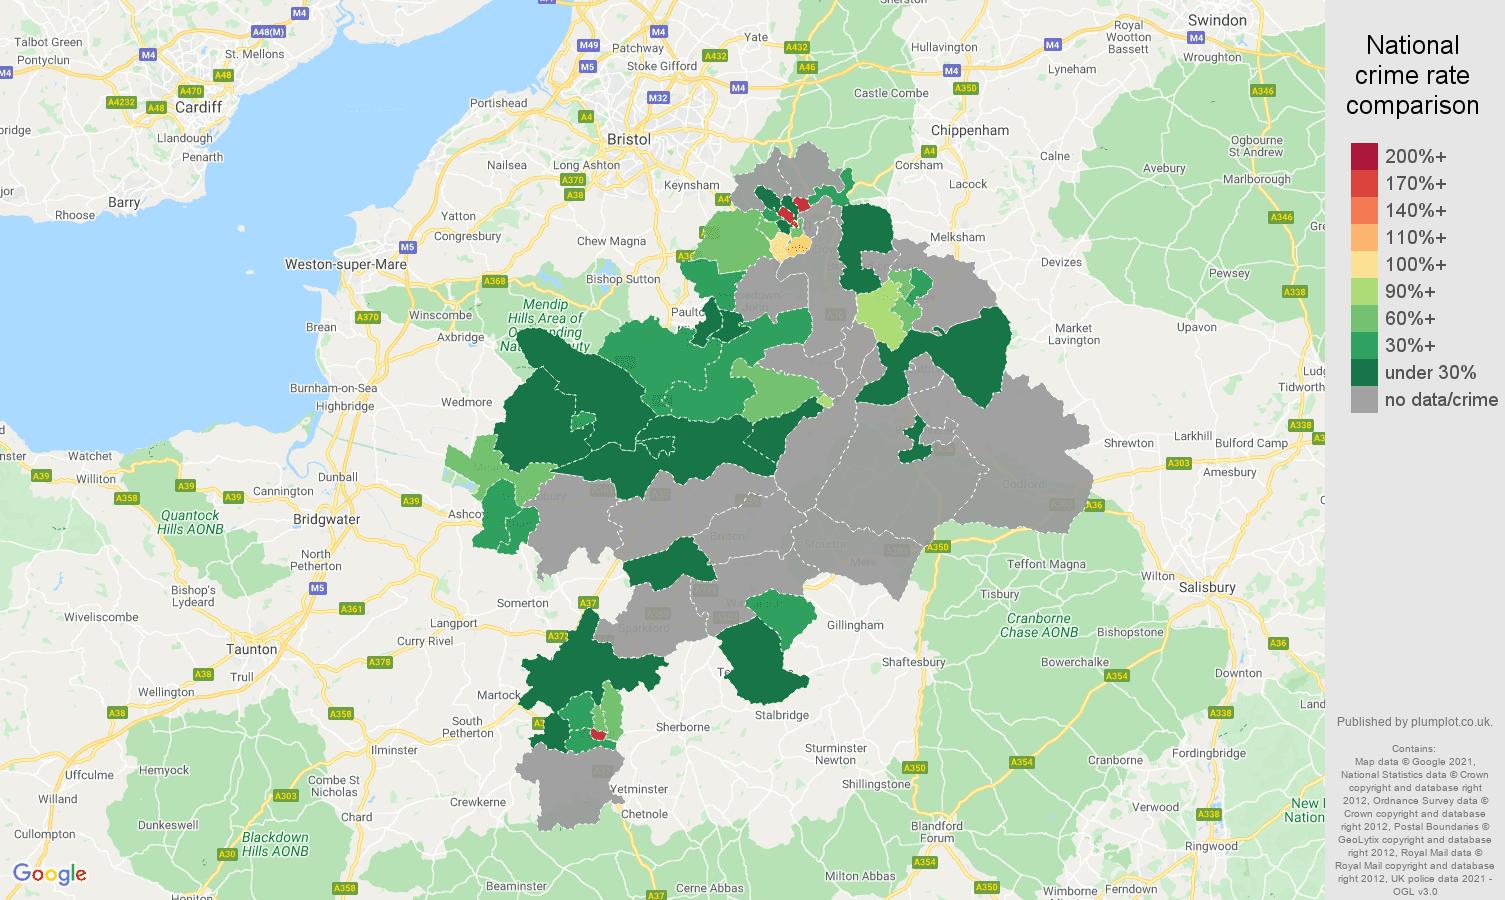 Bath robbery crime rate comparison map